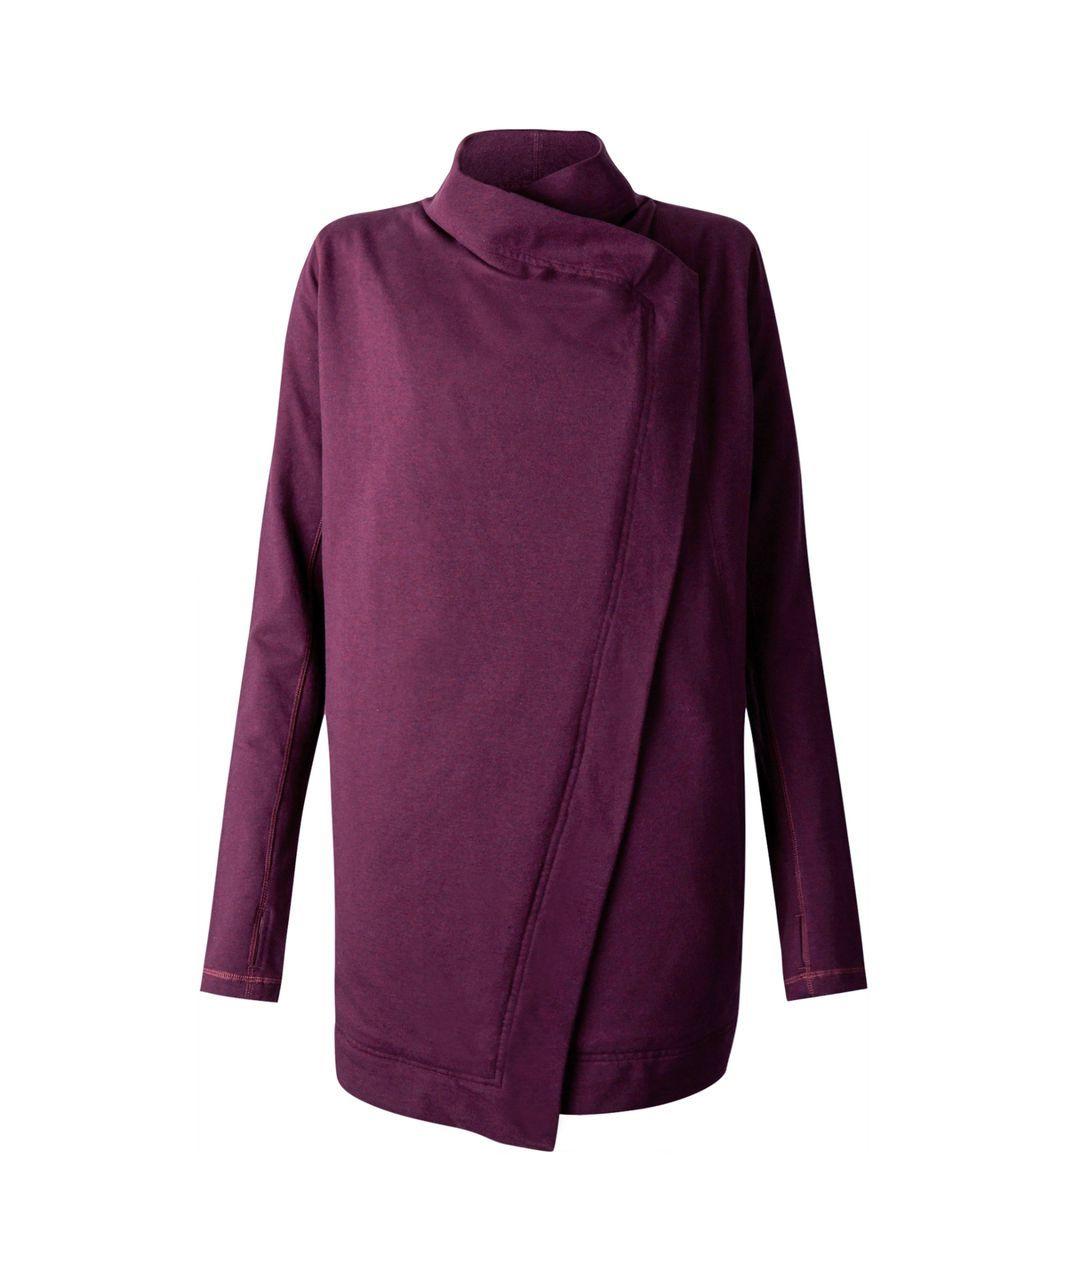 521b97fcc8dfa Lululemon Restore Wrap - Heathered Red Grape | Fashion | Style ...